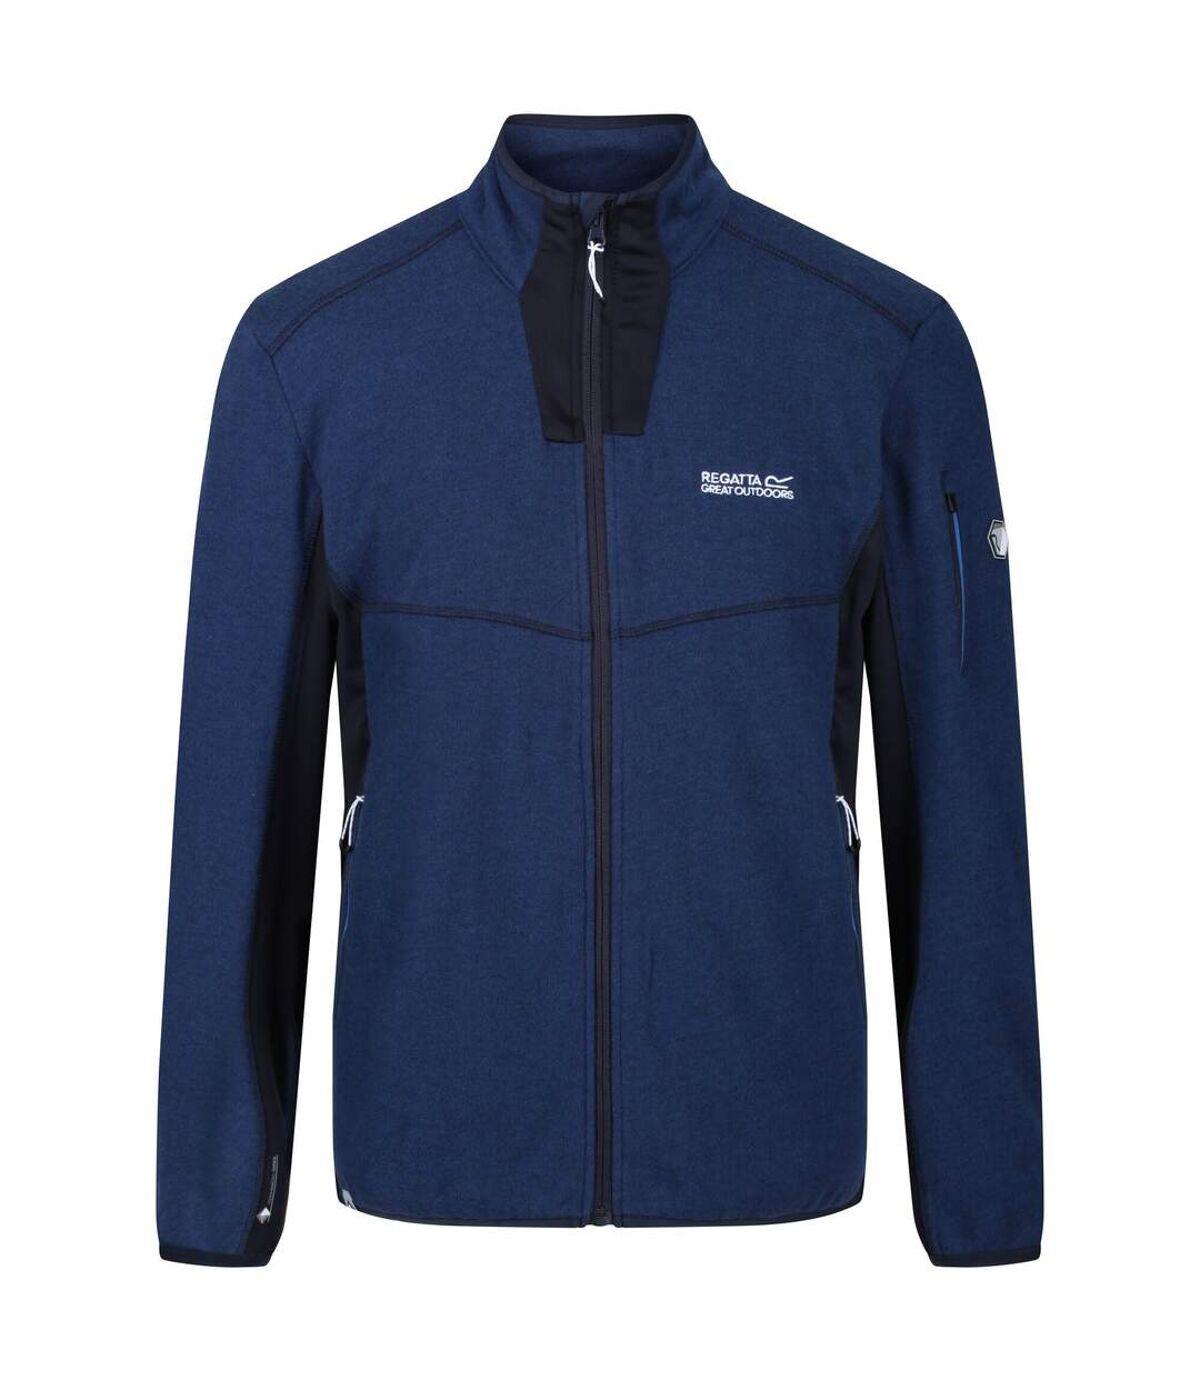 Regatta - Veste polaire KESTOR - Homme (Bleu/ Bleu marine) - UTRG4472